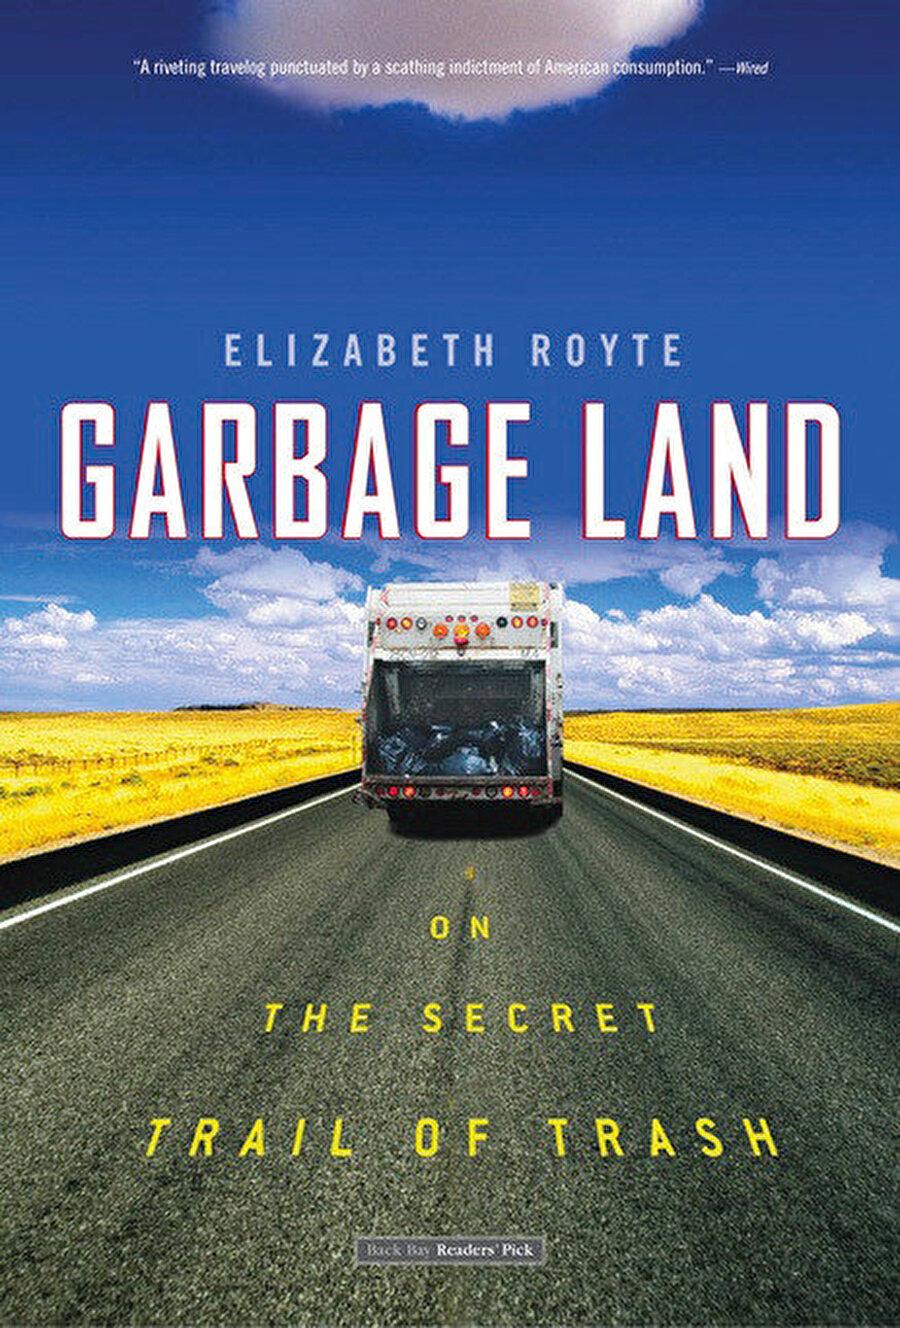 Elizabeth Royte, Garbage Land: On the Secret Trail of Trash